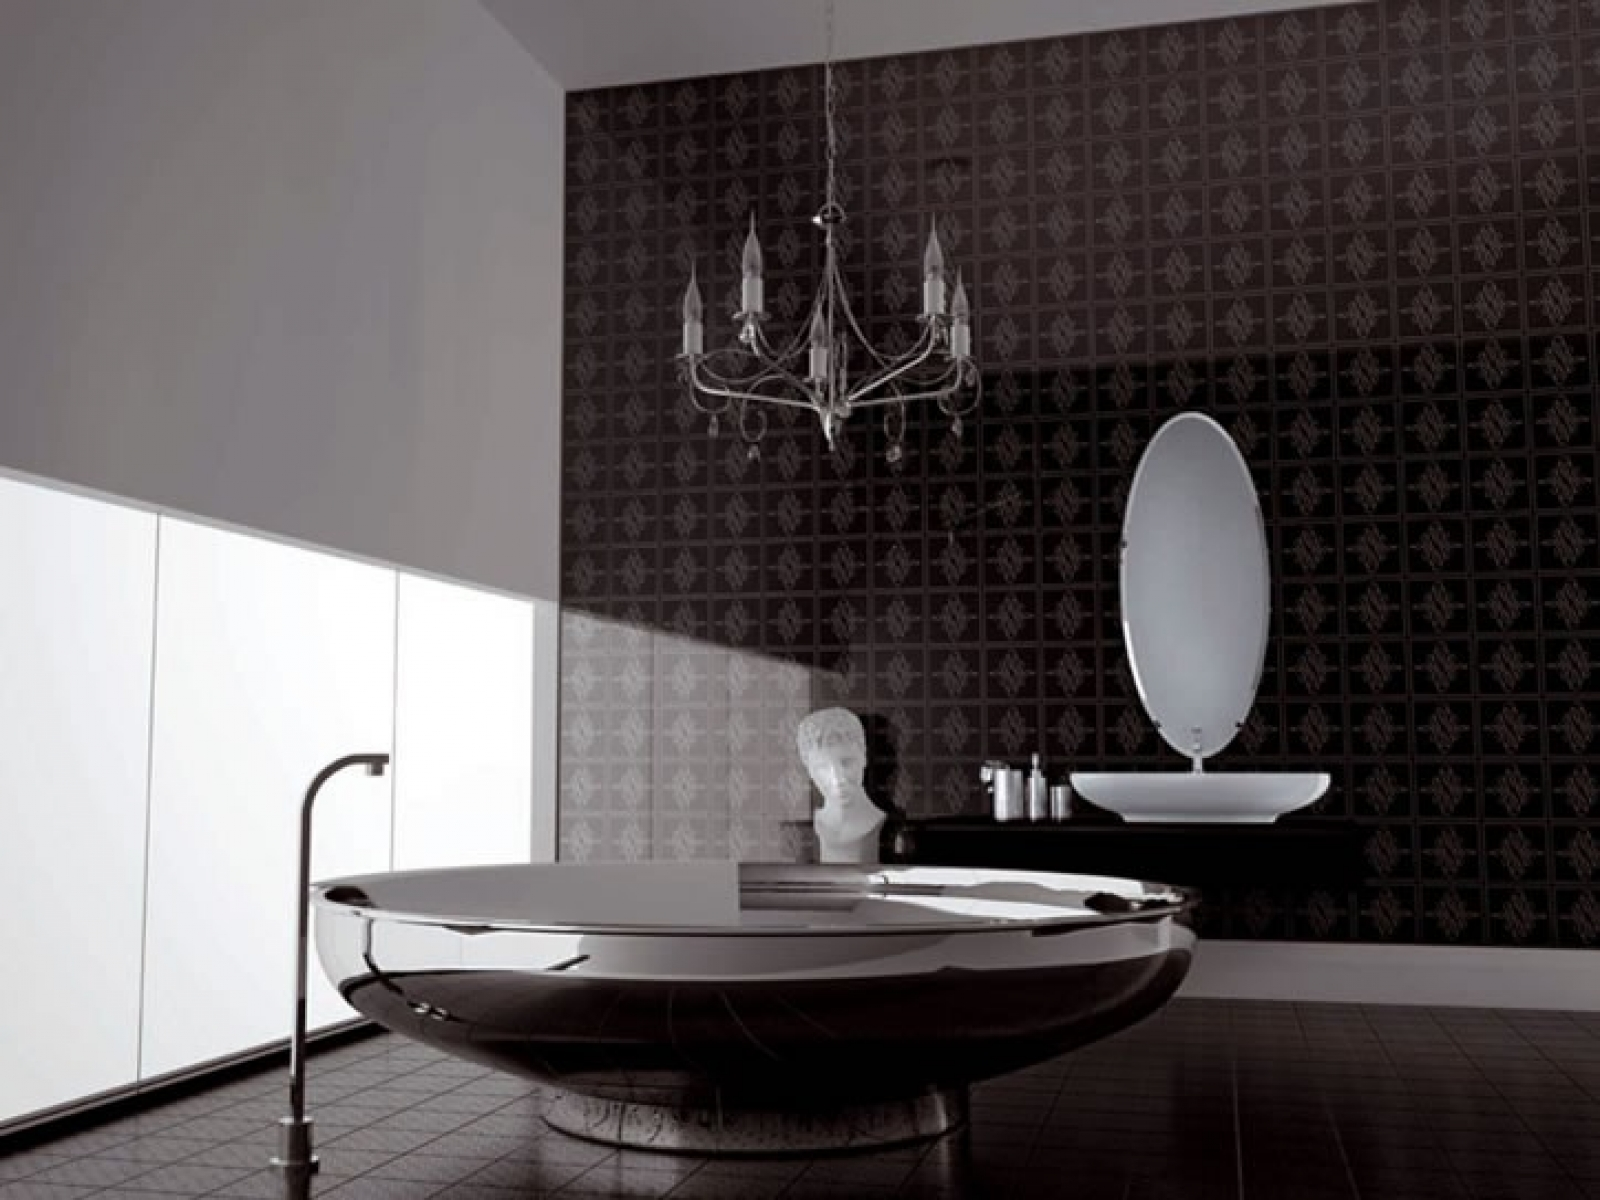 modern-stylish-bathroom-design-with-black-decorative-bathroom-ceramic-tile-modern-bedroom-designs (1)